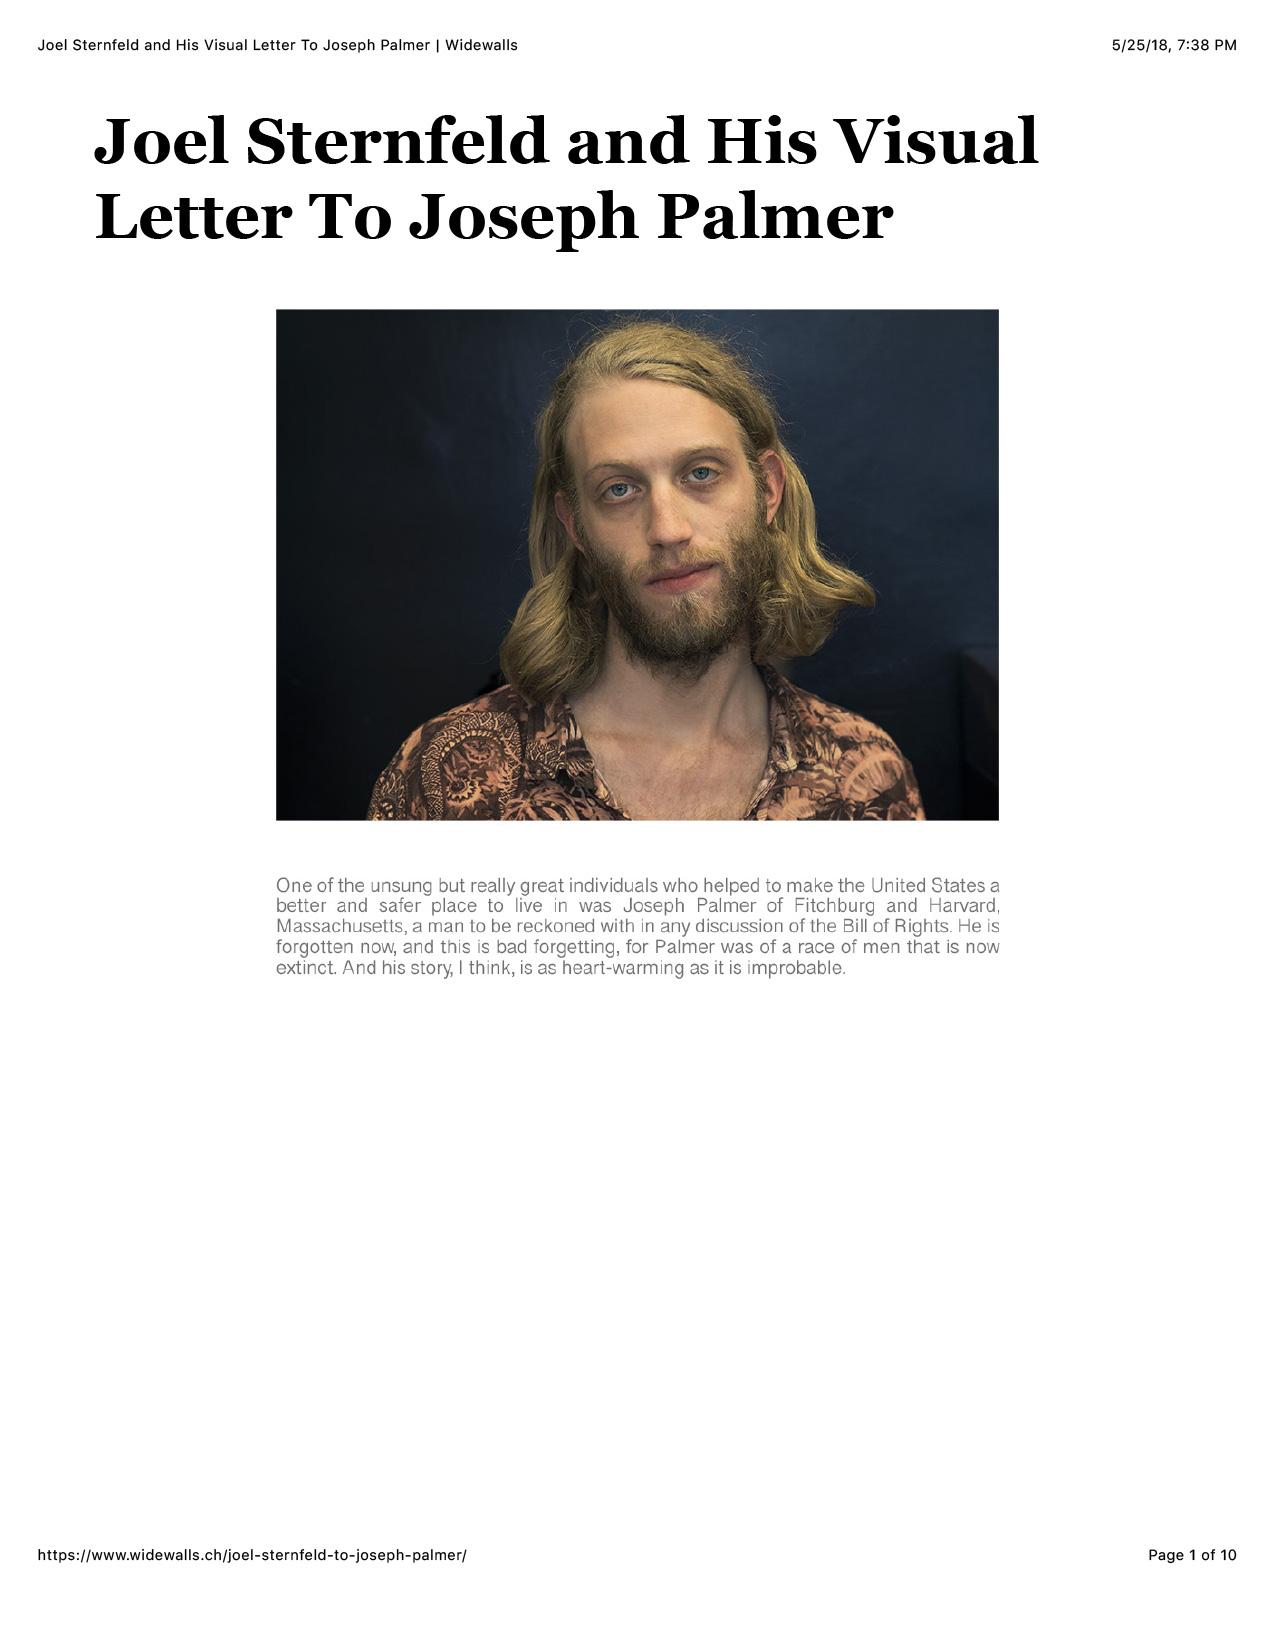 Joel-Sternfeld-and-His-Visual-Letter-To-Joseph-Palmer-_-Widewalls-1.jpg